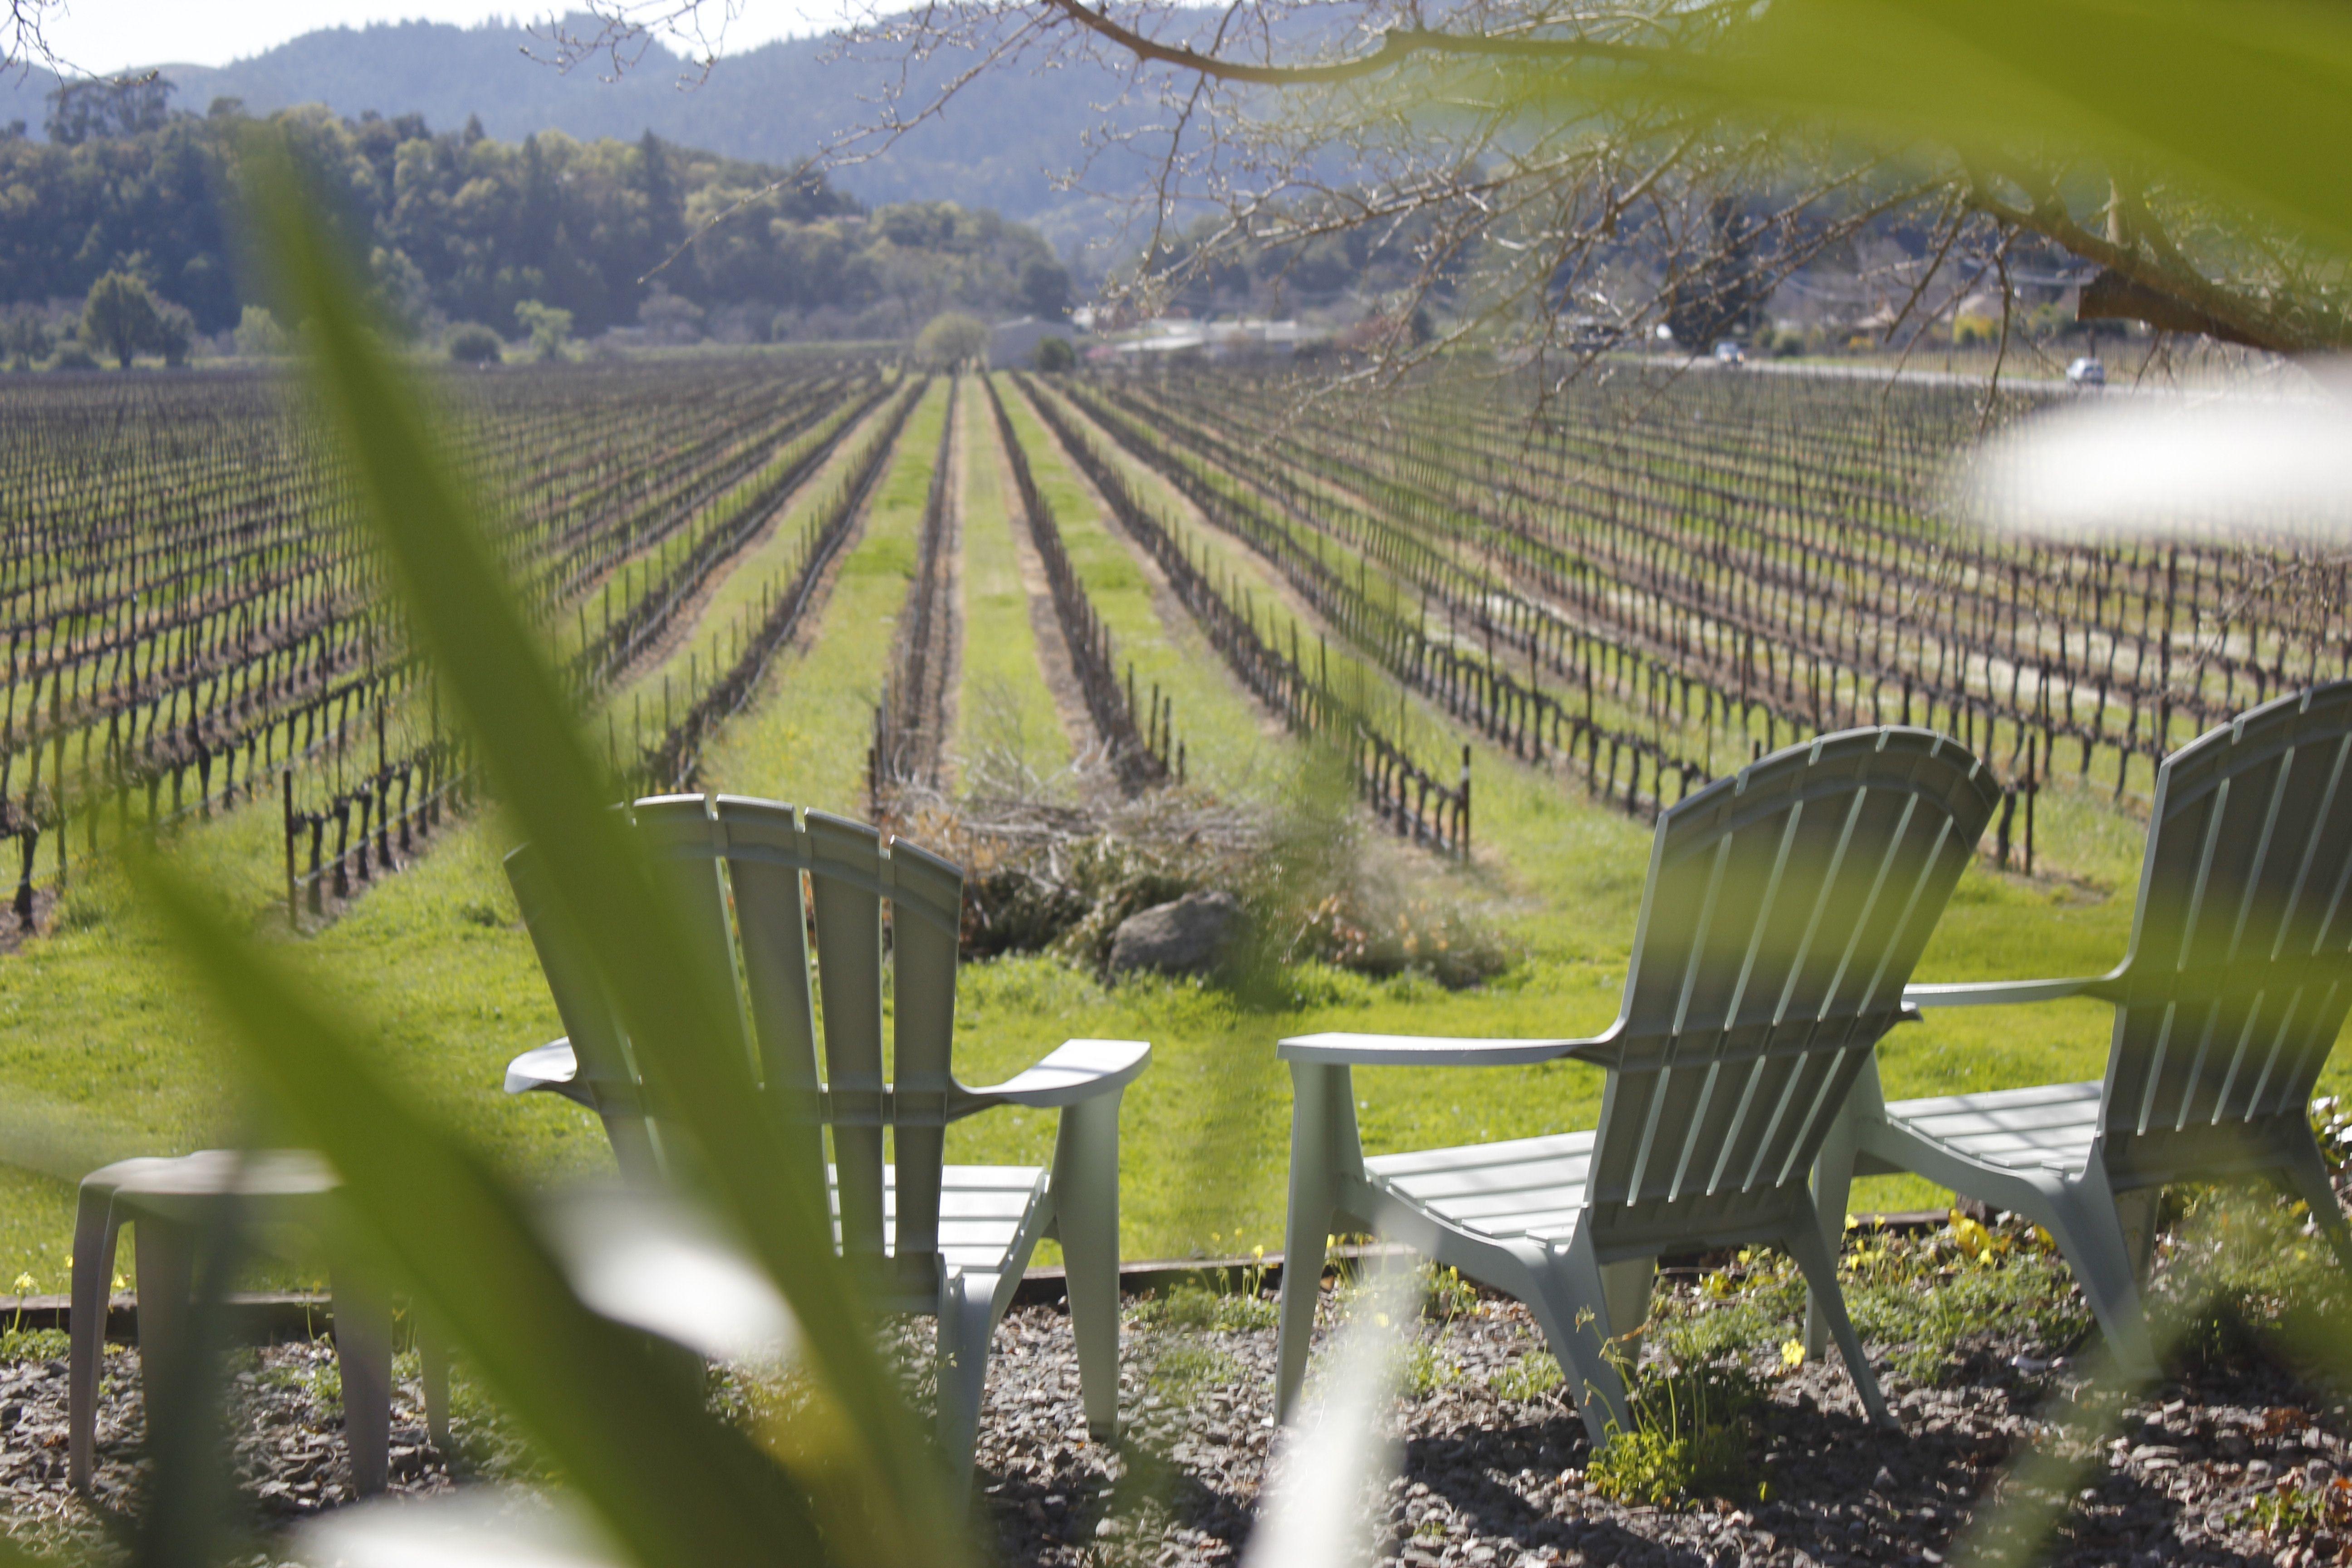 Old Crocker Inn Sonoma wine country, Sonoma county